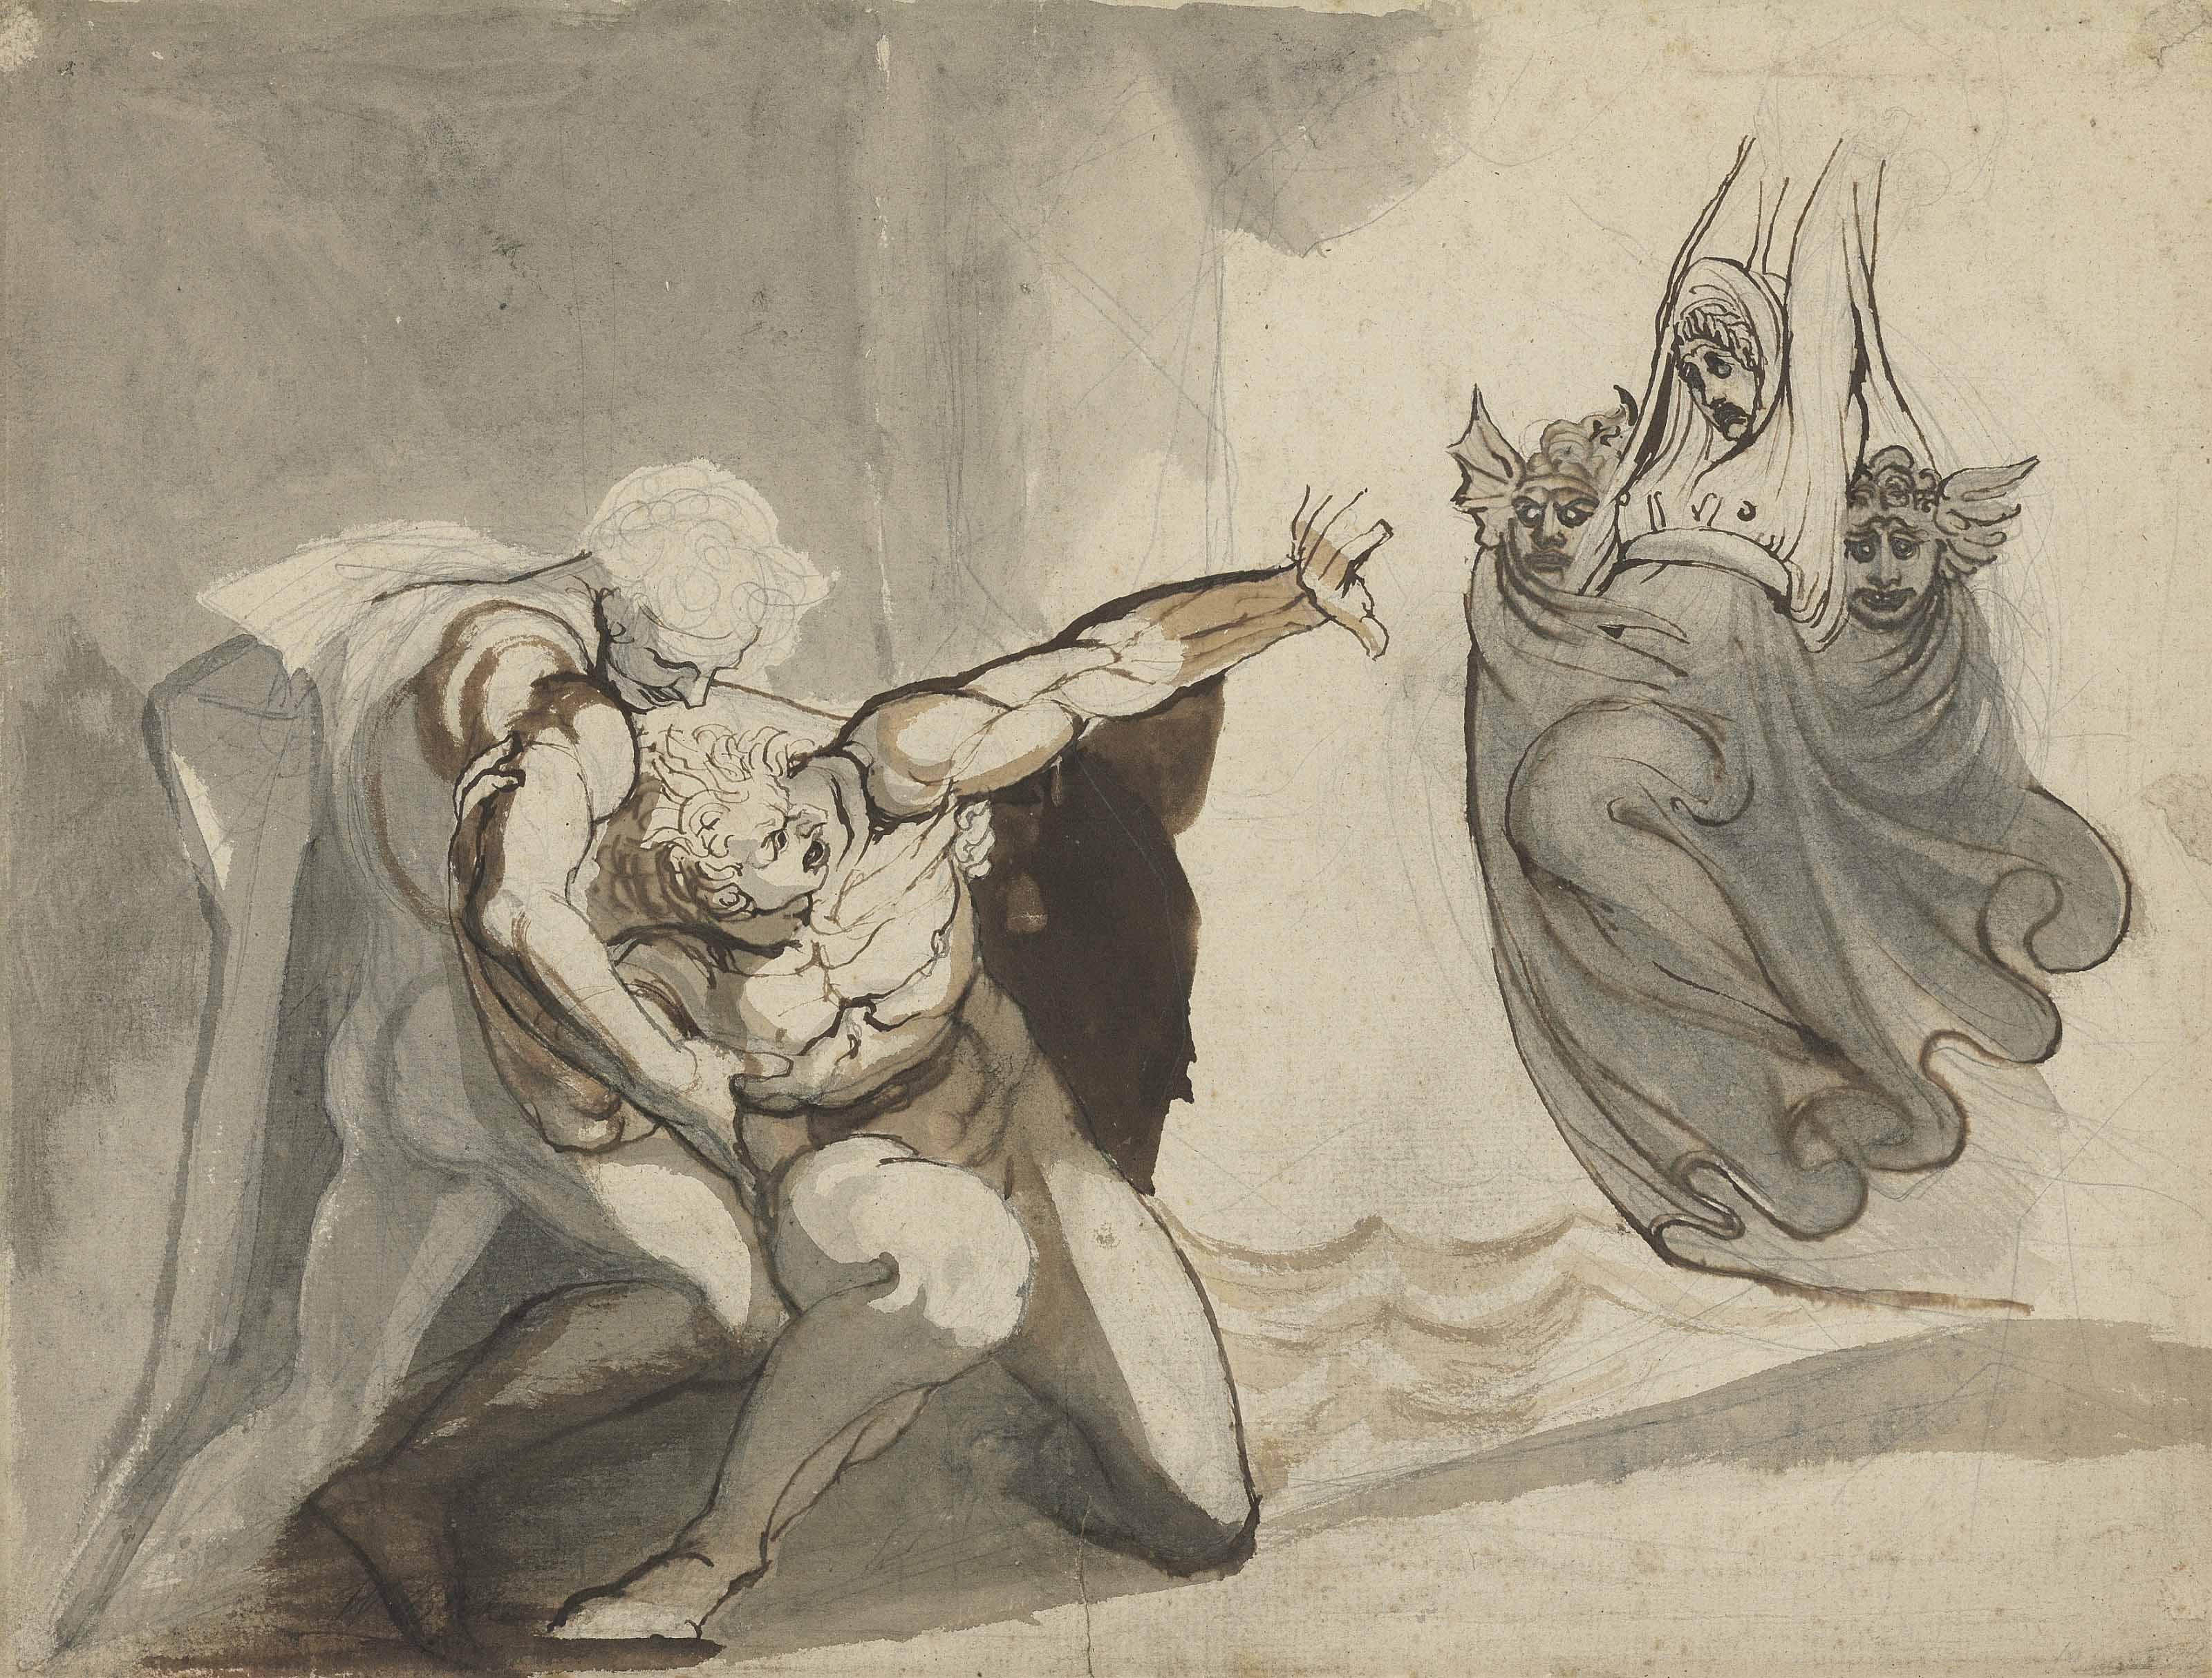 Johann Heinrich Füssli, Henry Fuseli, R.A. (Zurich 1741-1825 Putney Hill)